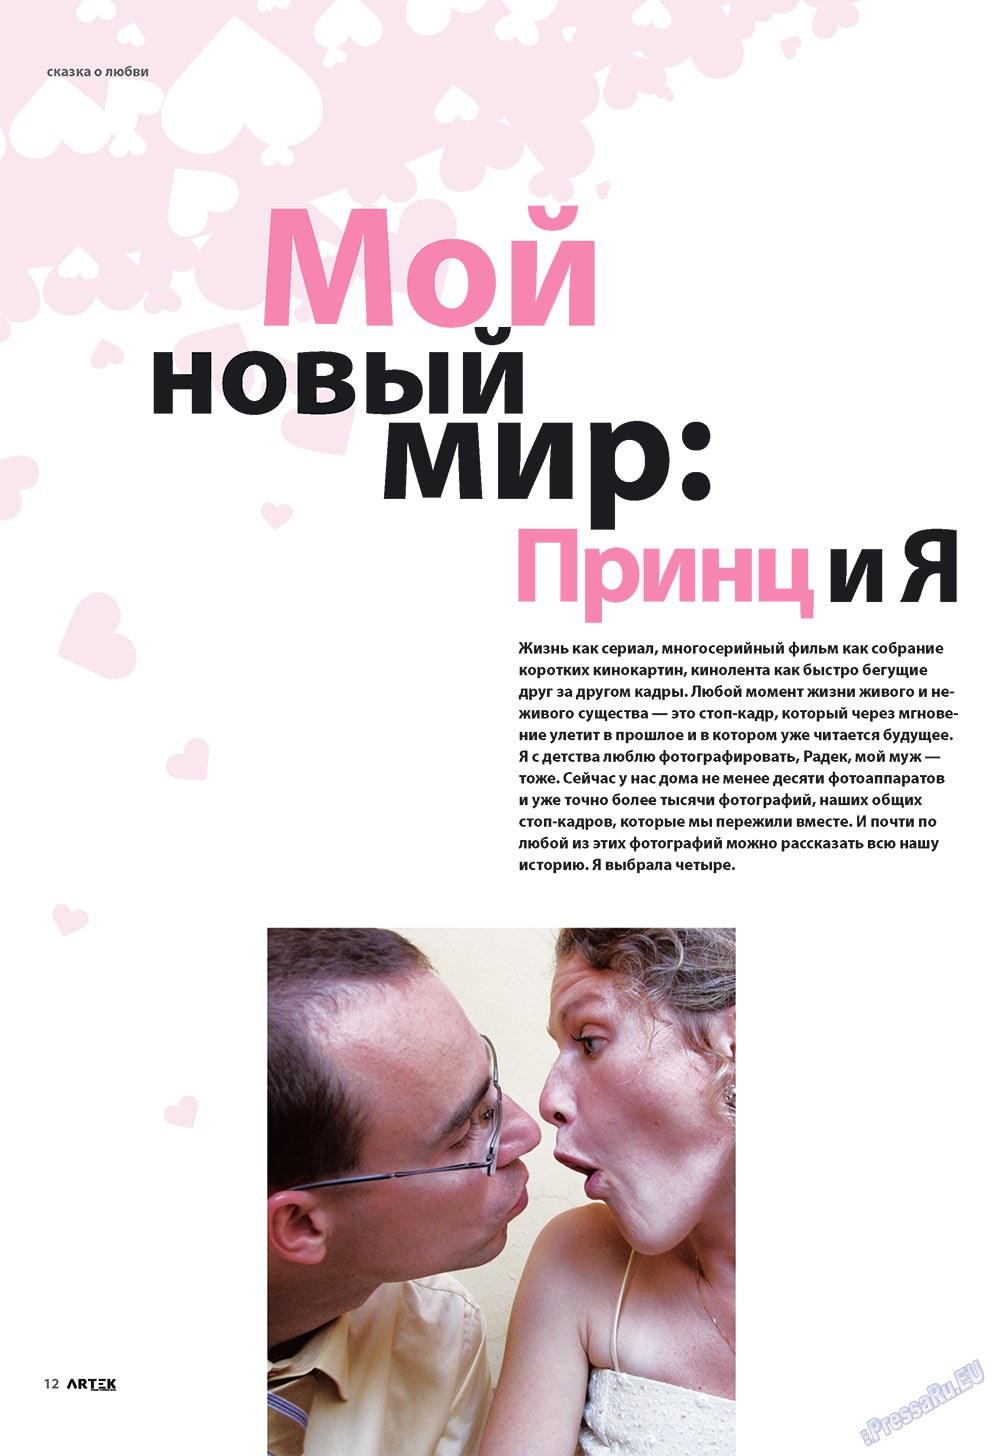 Артек (журнал). 2009 год, номер 6, стр. 14